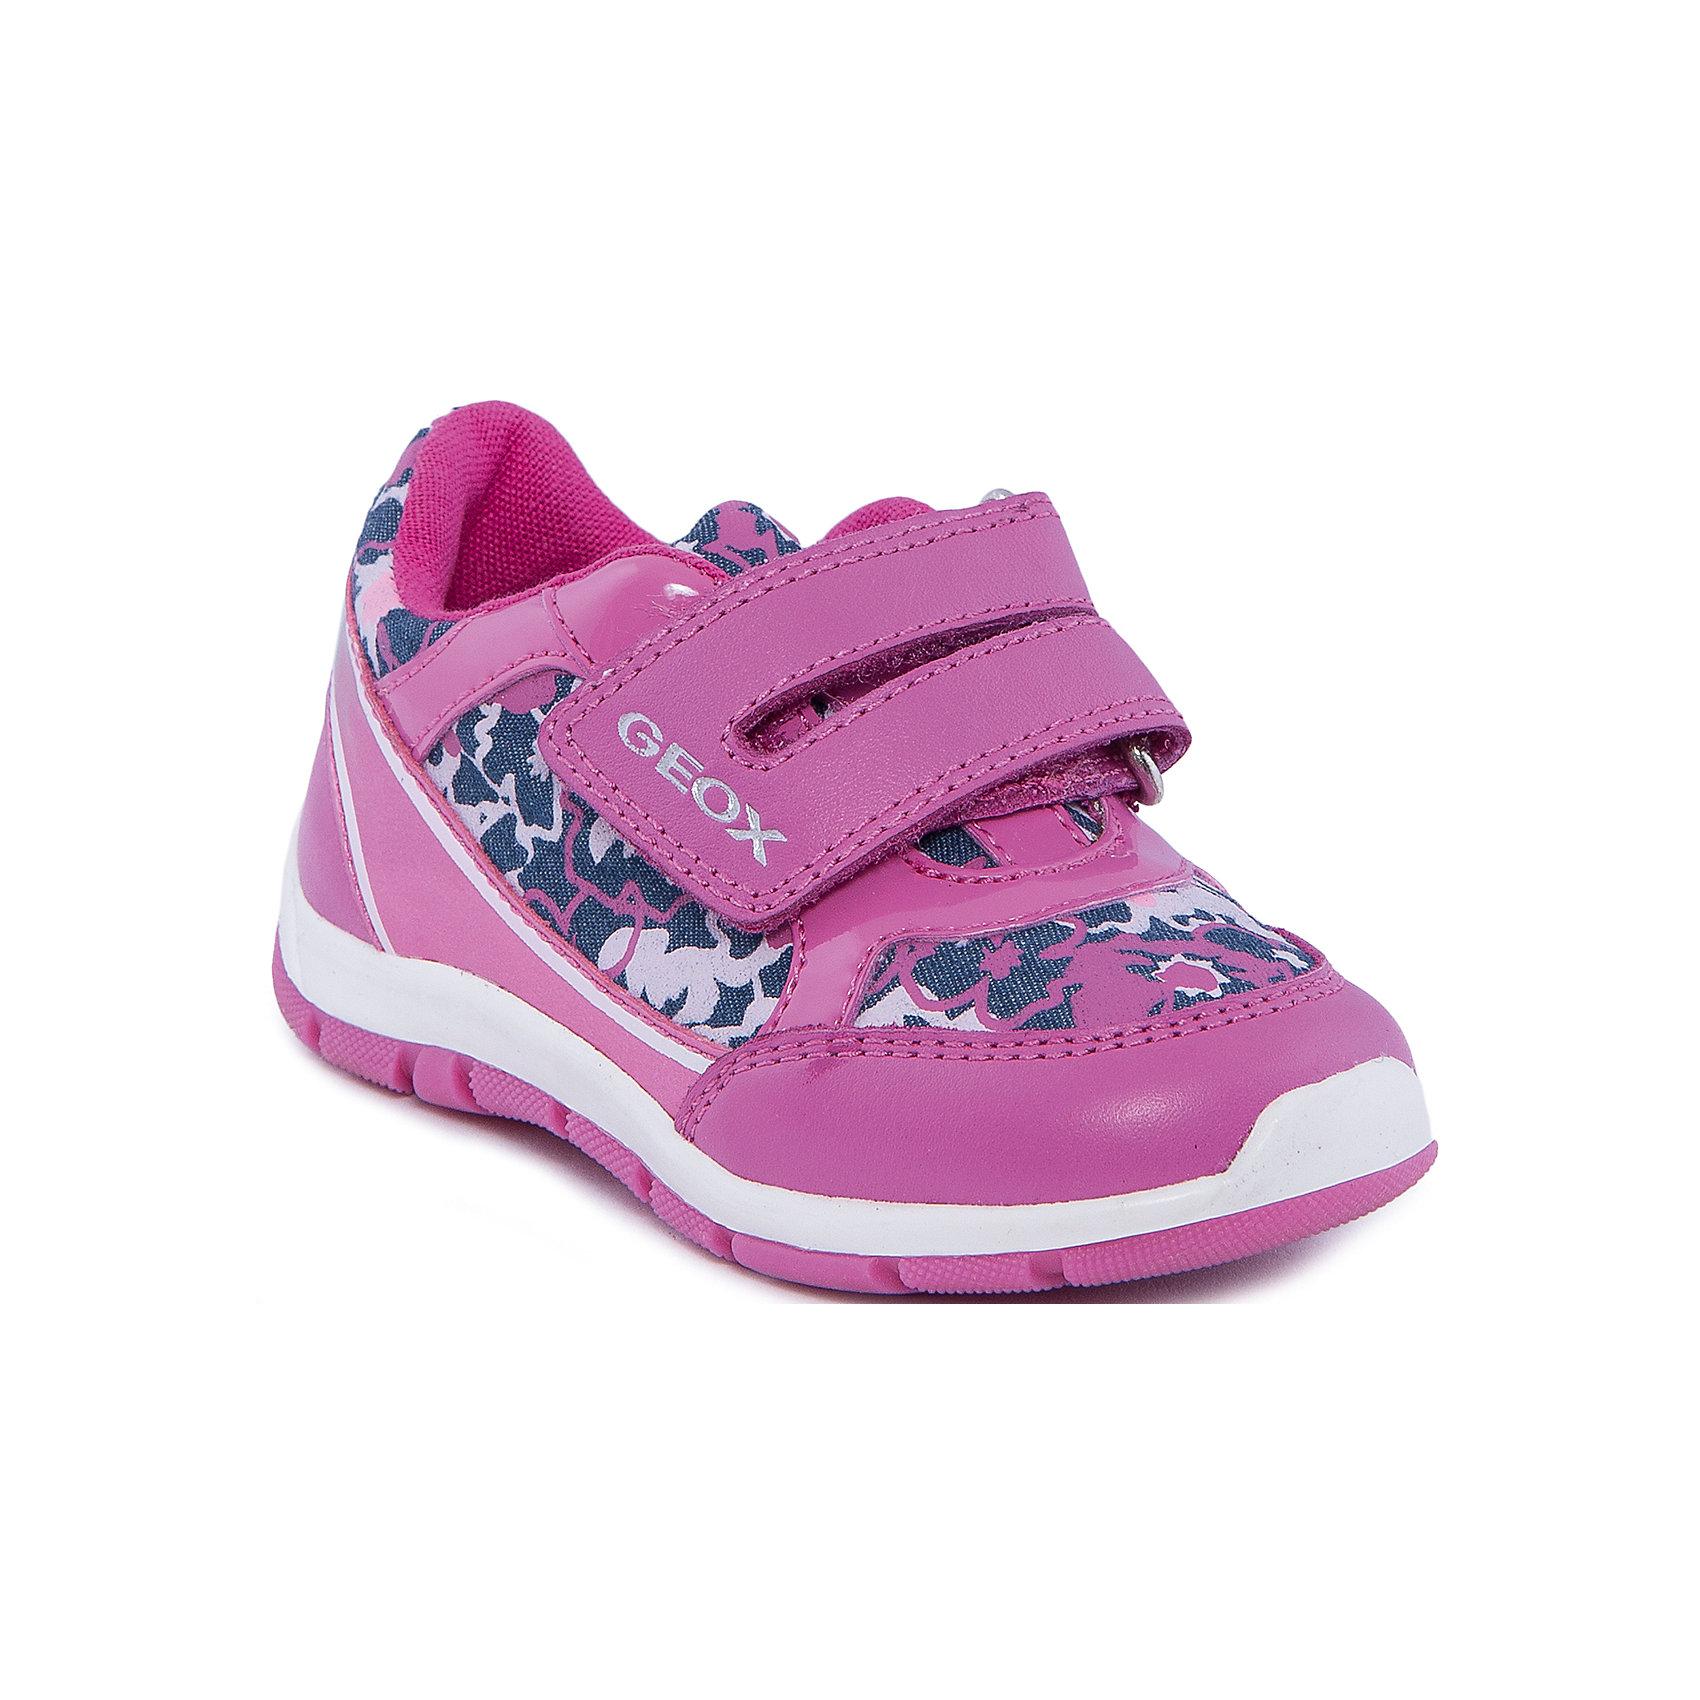 GEOX Кроссовки для девочки GEOX geox geox кроссовки светящиеся розовые